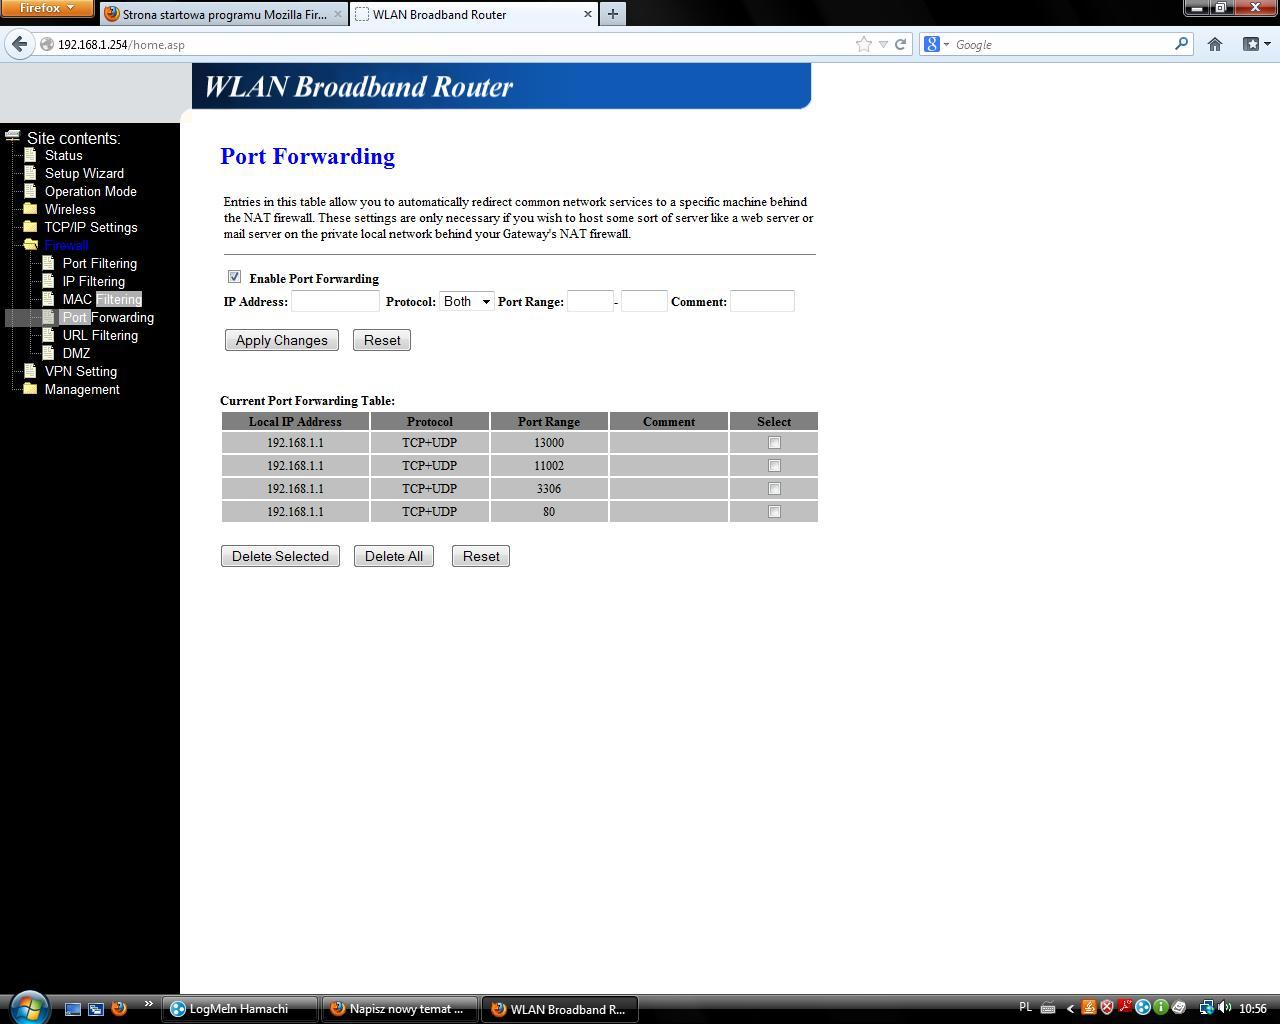 Lg lh3000 firmware 3.15